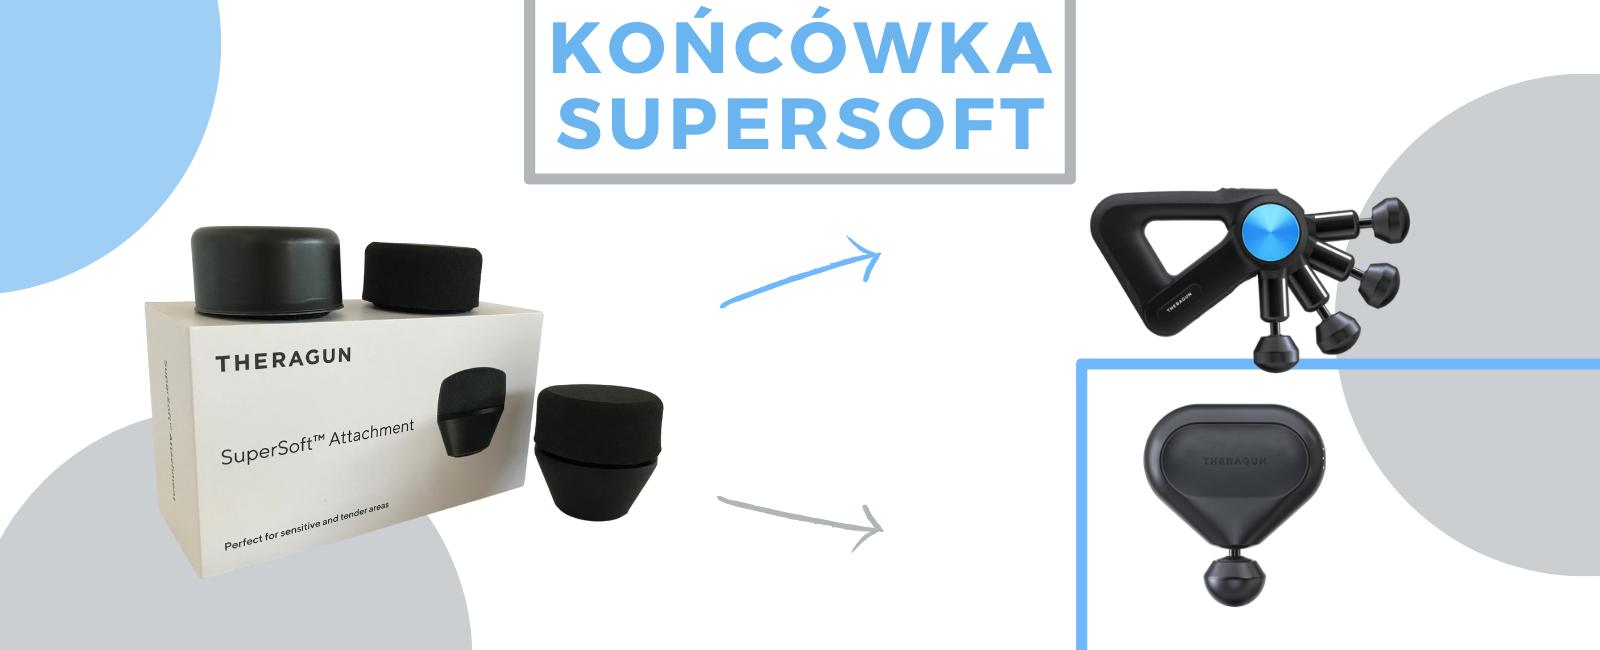 Supersoft Koncowka Do Masazera W Ksztalcie Poduszki Bardzo Miekka Koncowka Do Masazera Theragun Pro I Theragun Mini.jpg